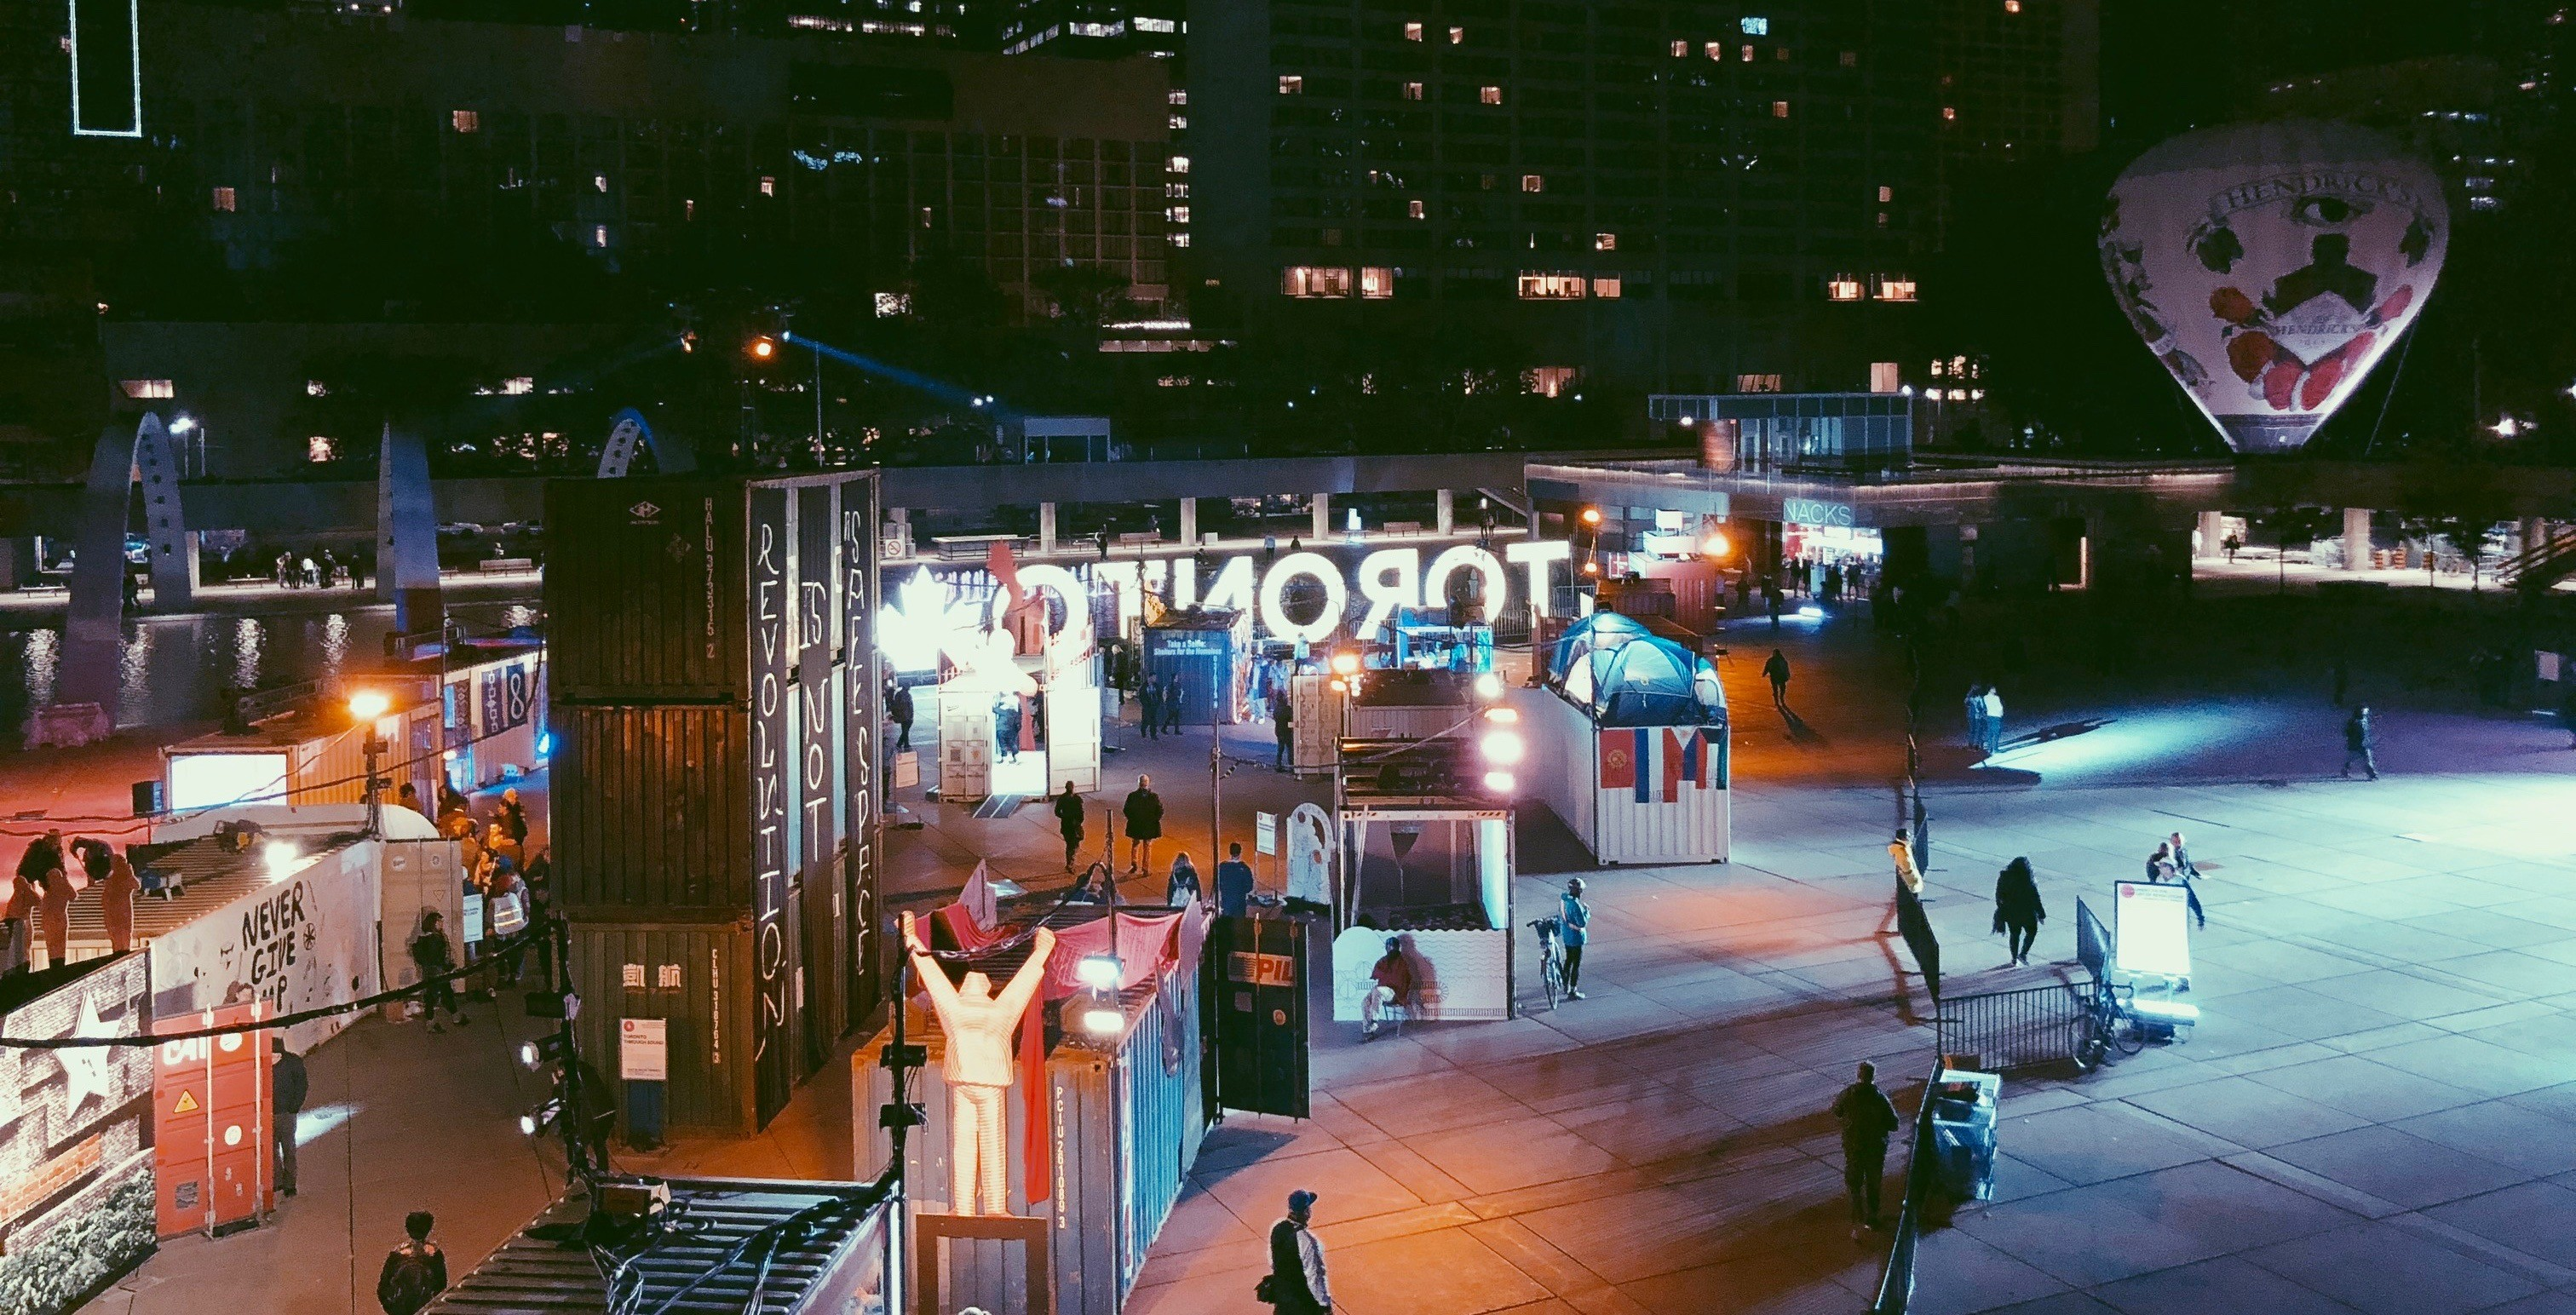 Nuit Blanche through the eyes of a Toronto photographer (PHOTOS)